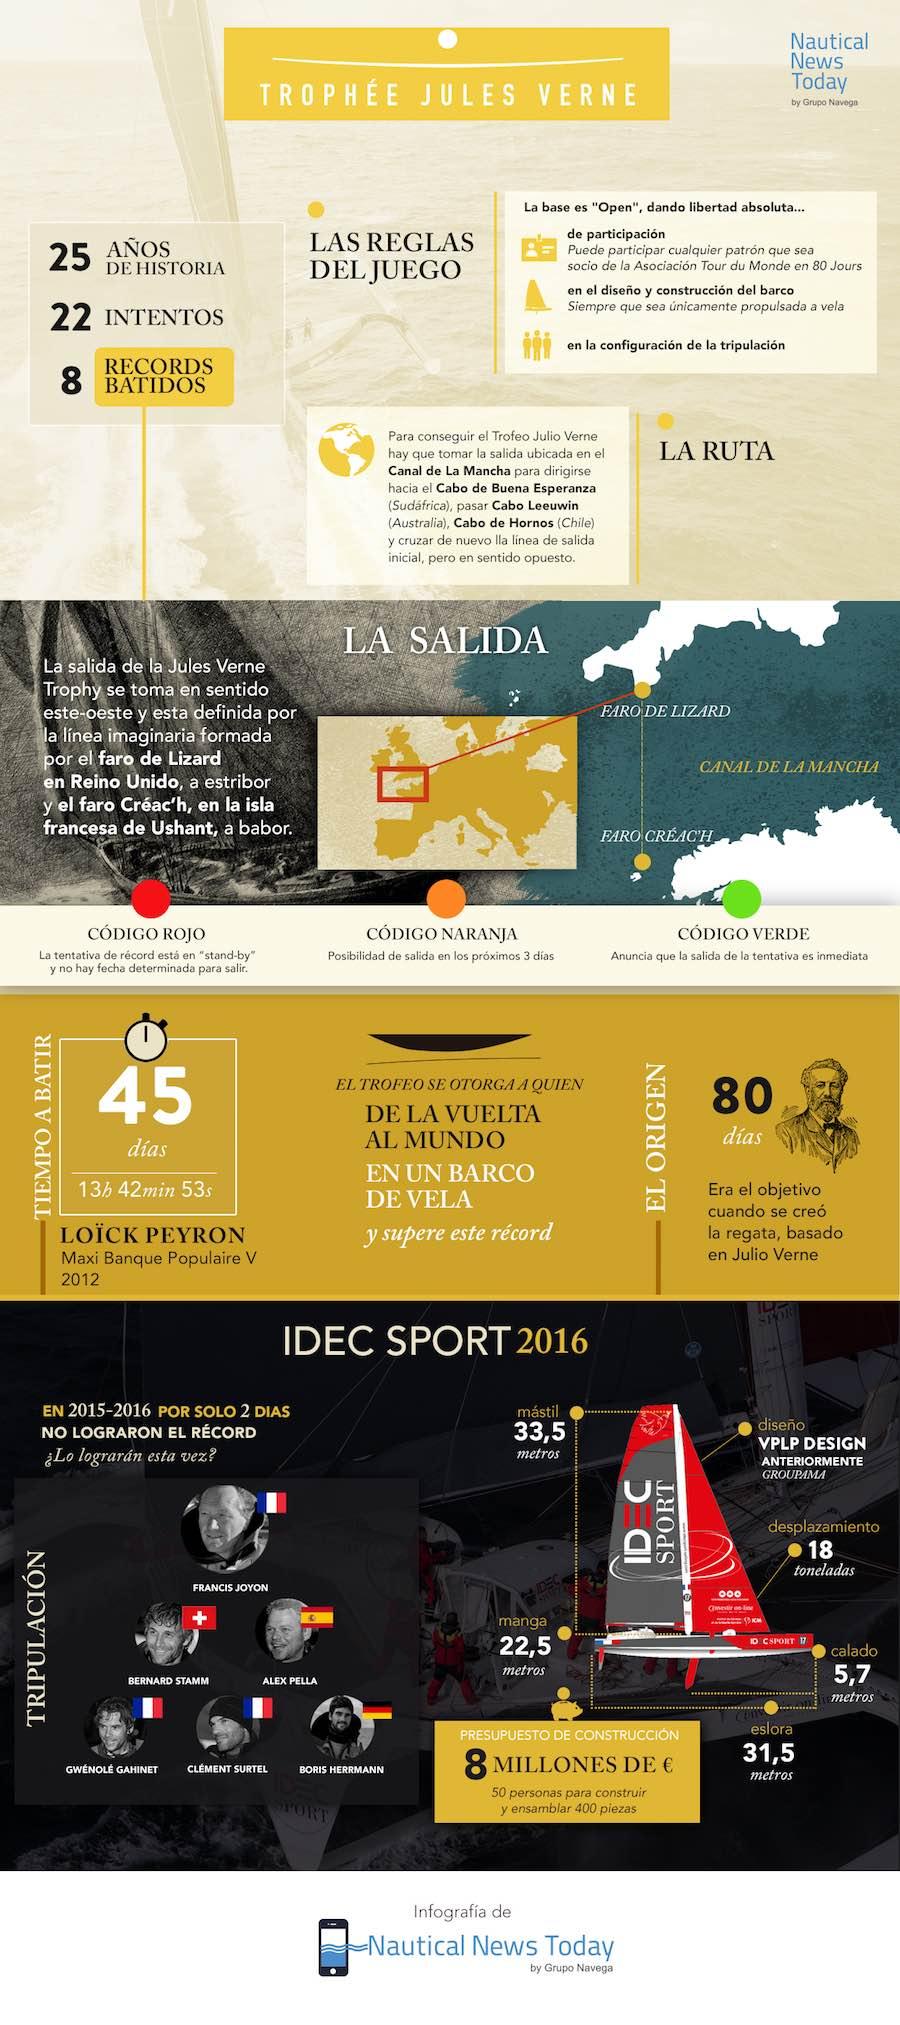 infografia trofeo julio verne 2016 1 idec sport 900